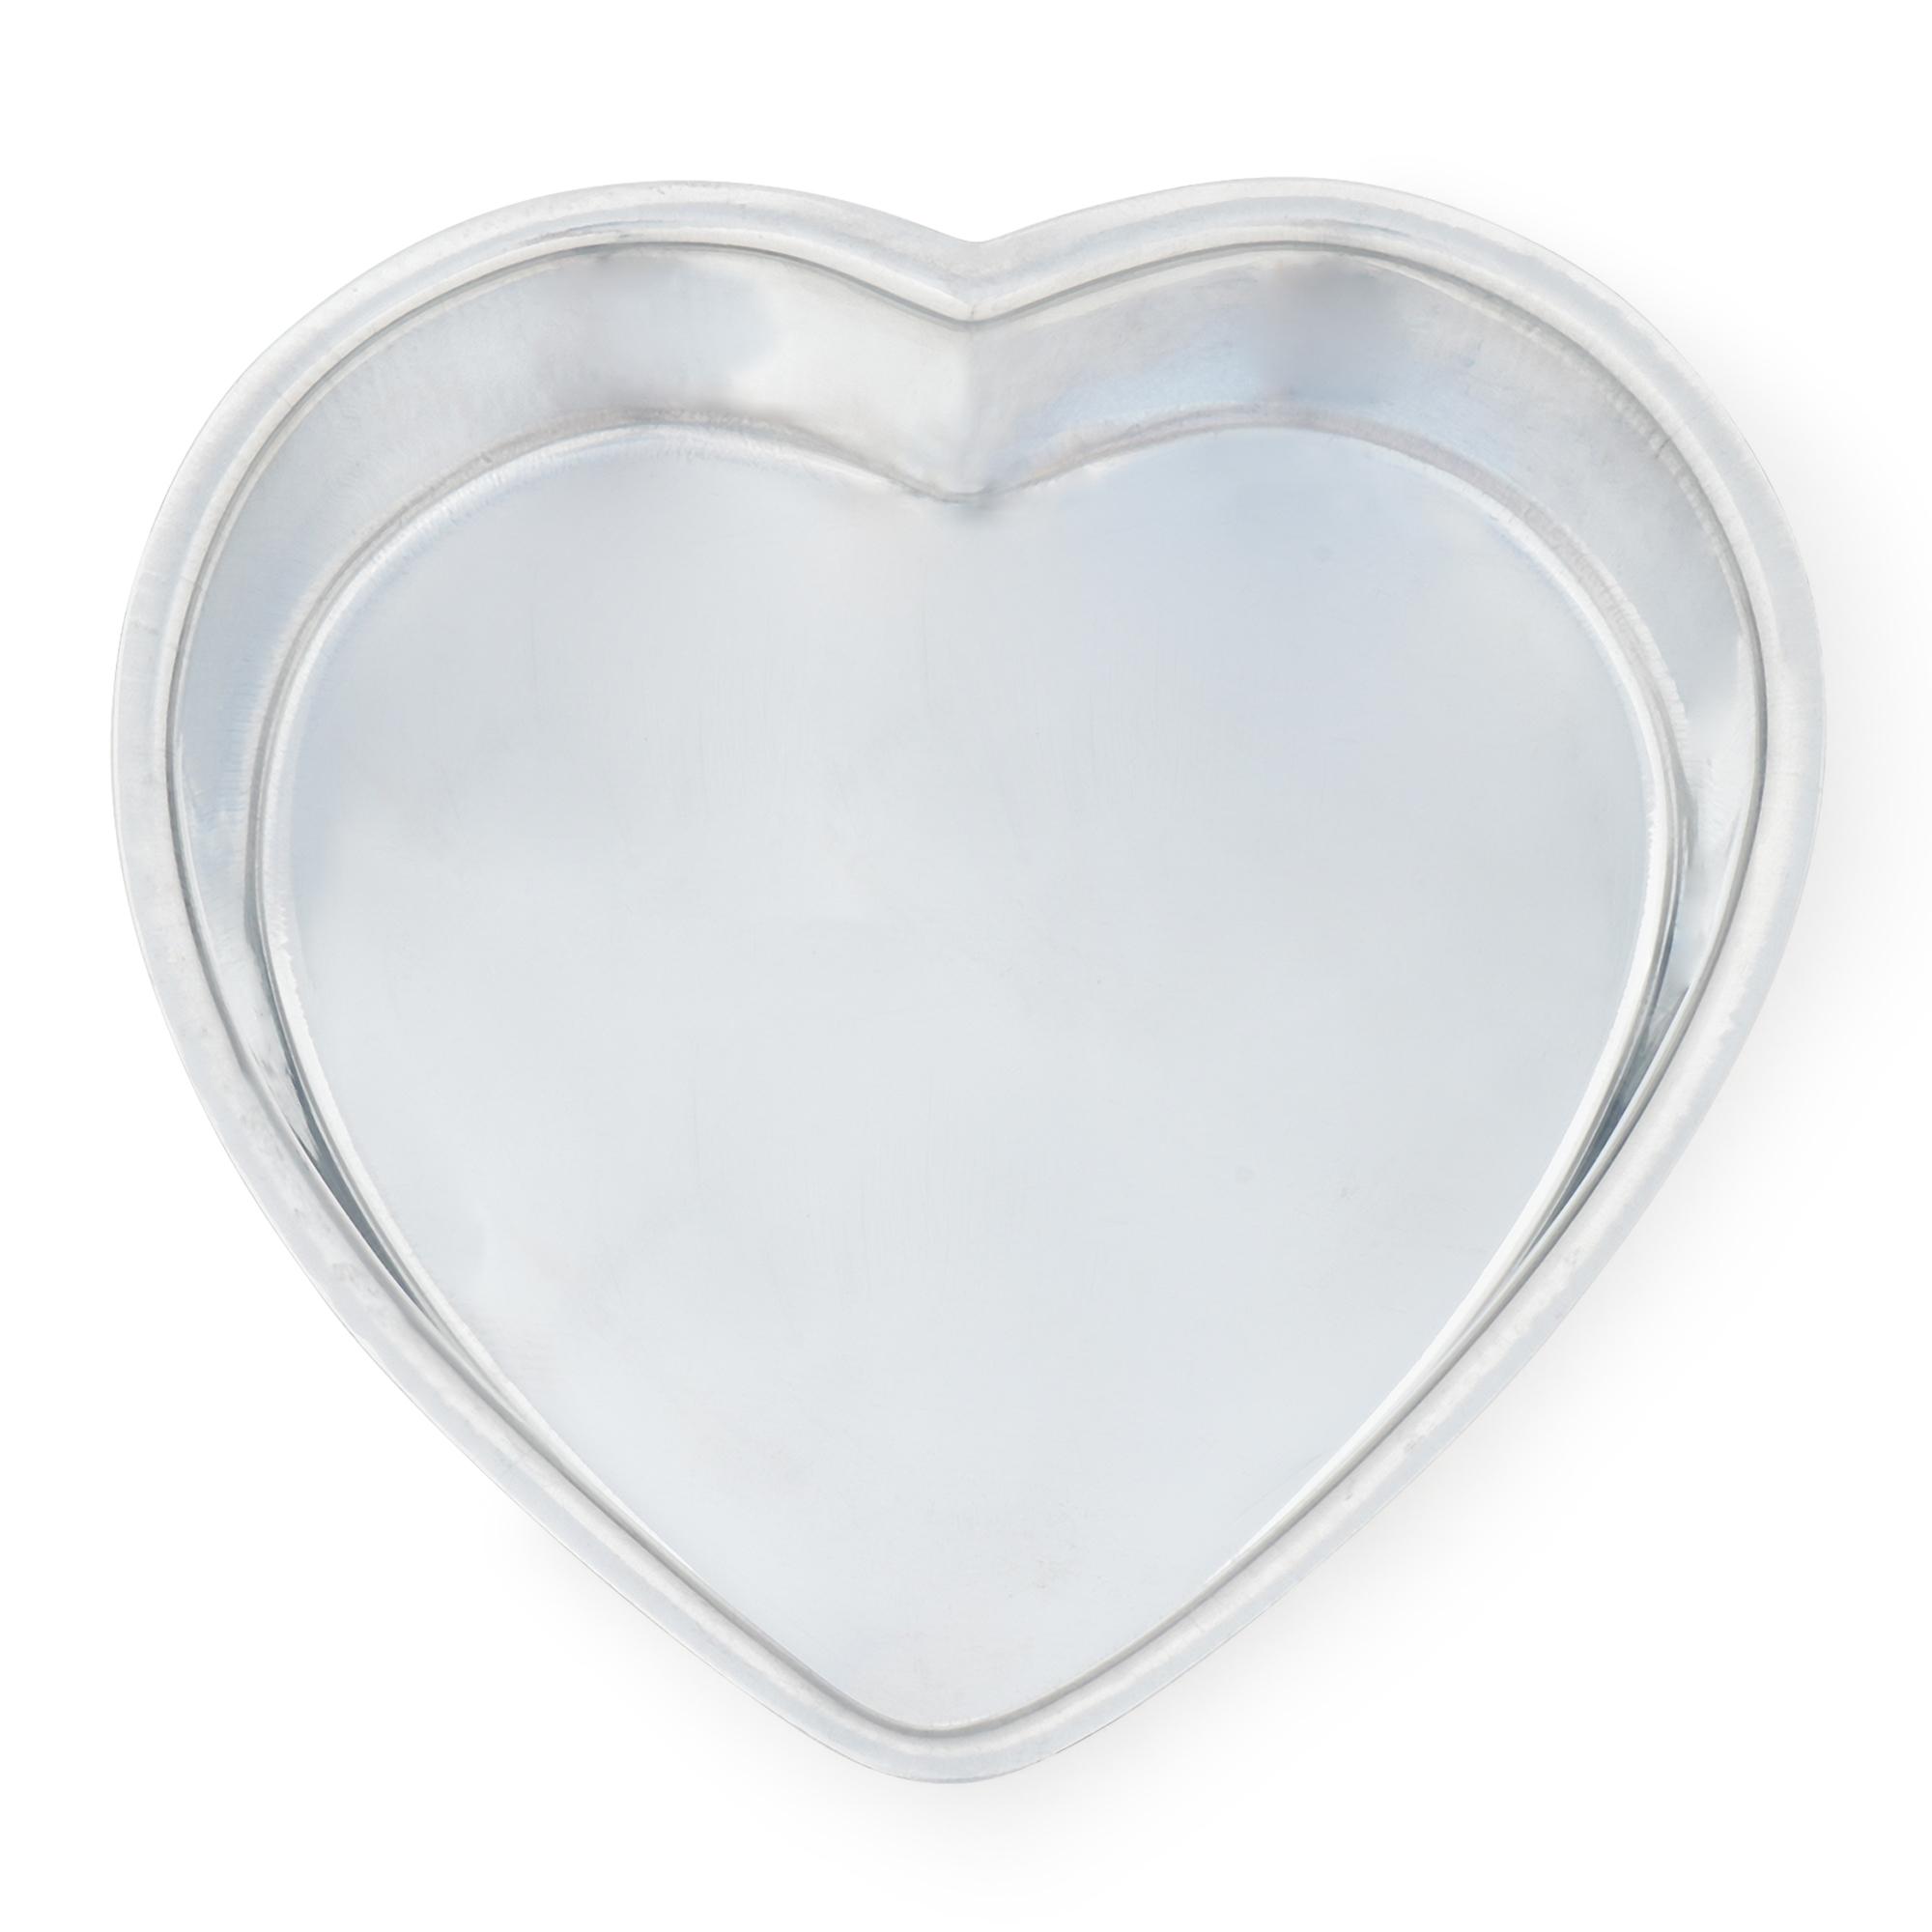 Heart Cake Mould